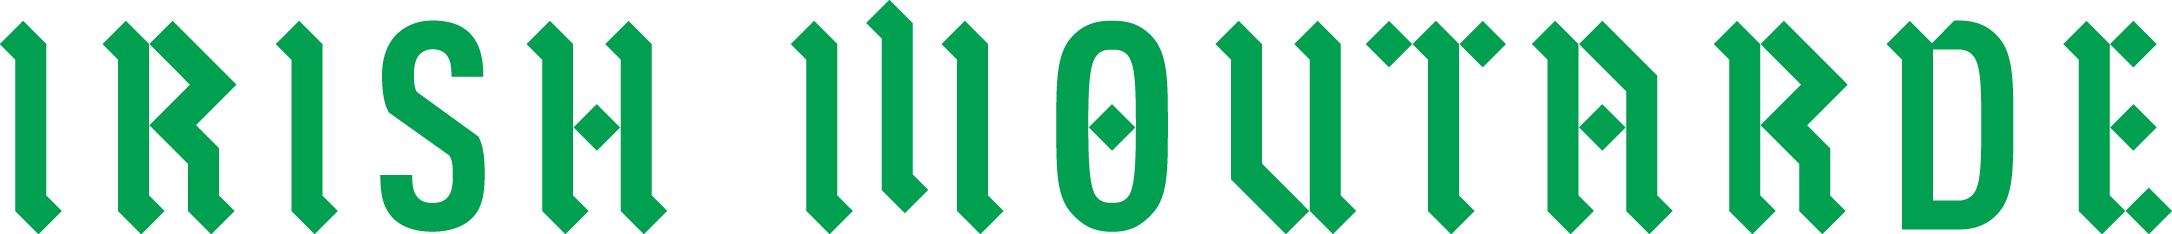 IrishMoutarde-Logo-2016-Signature-Vert